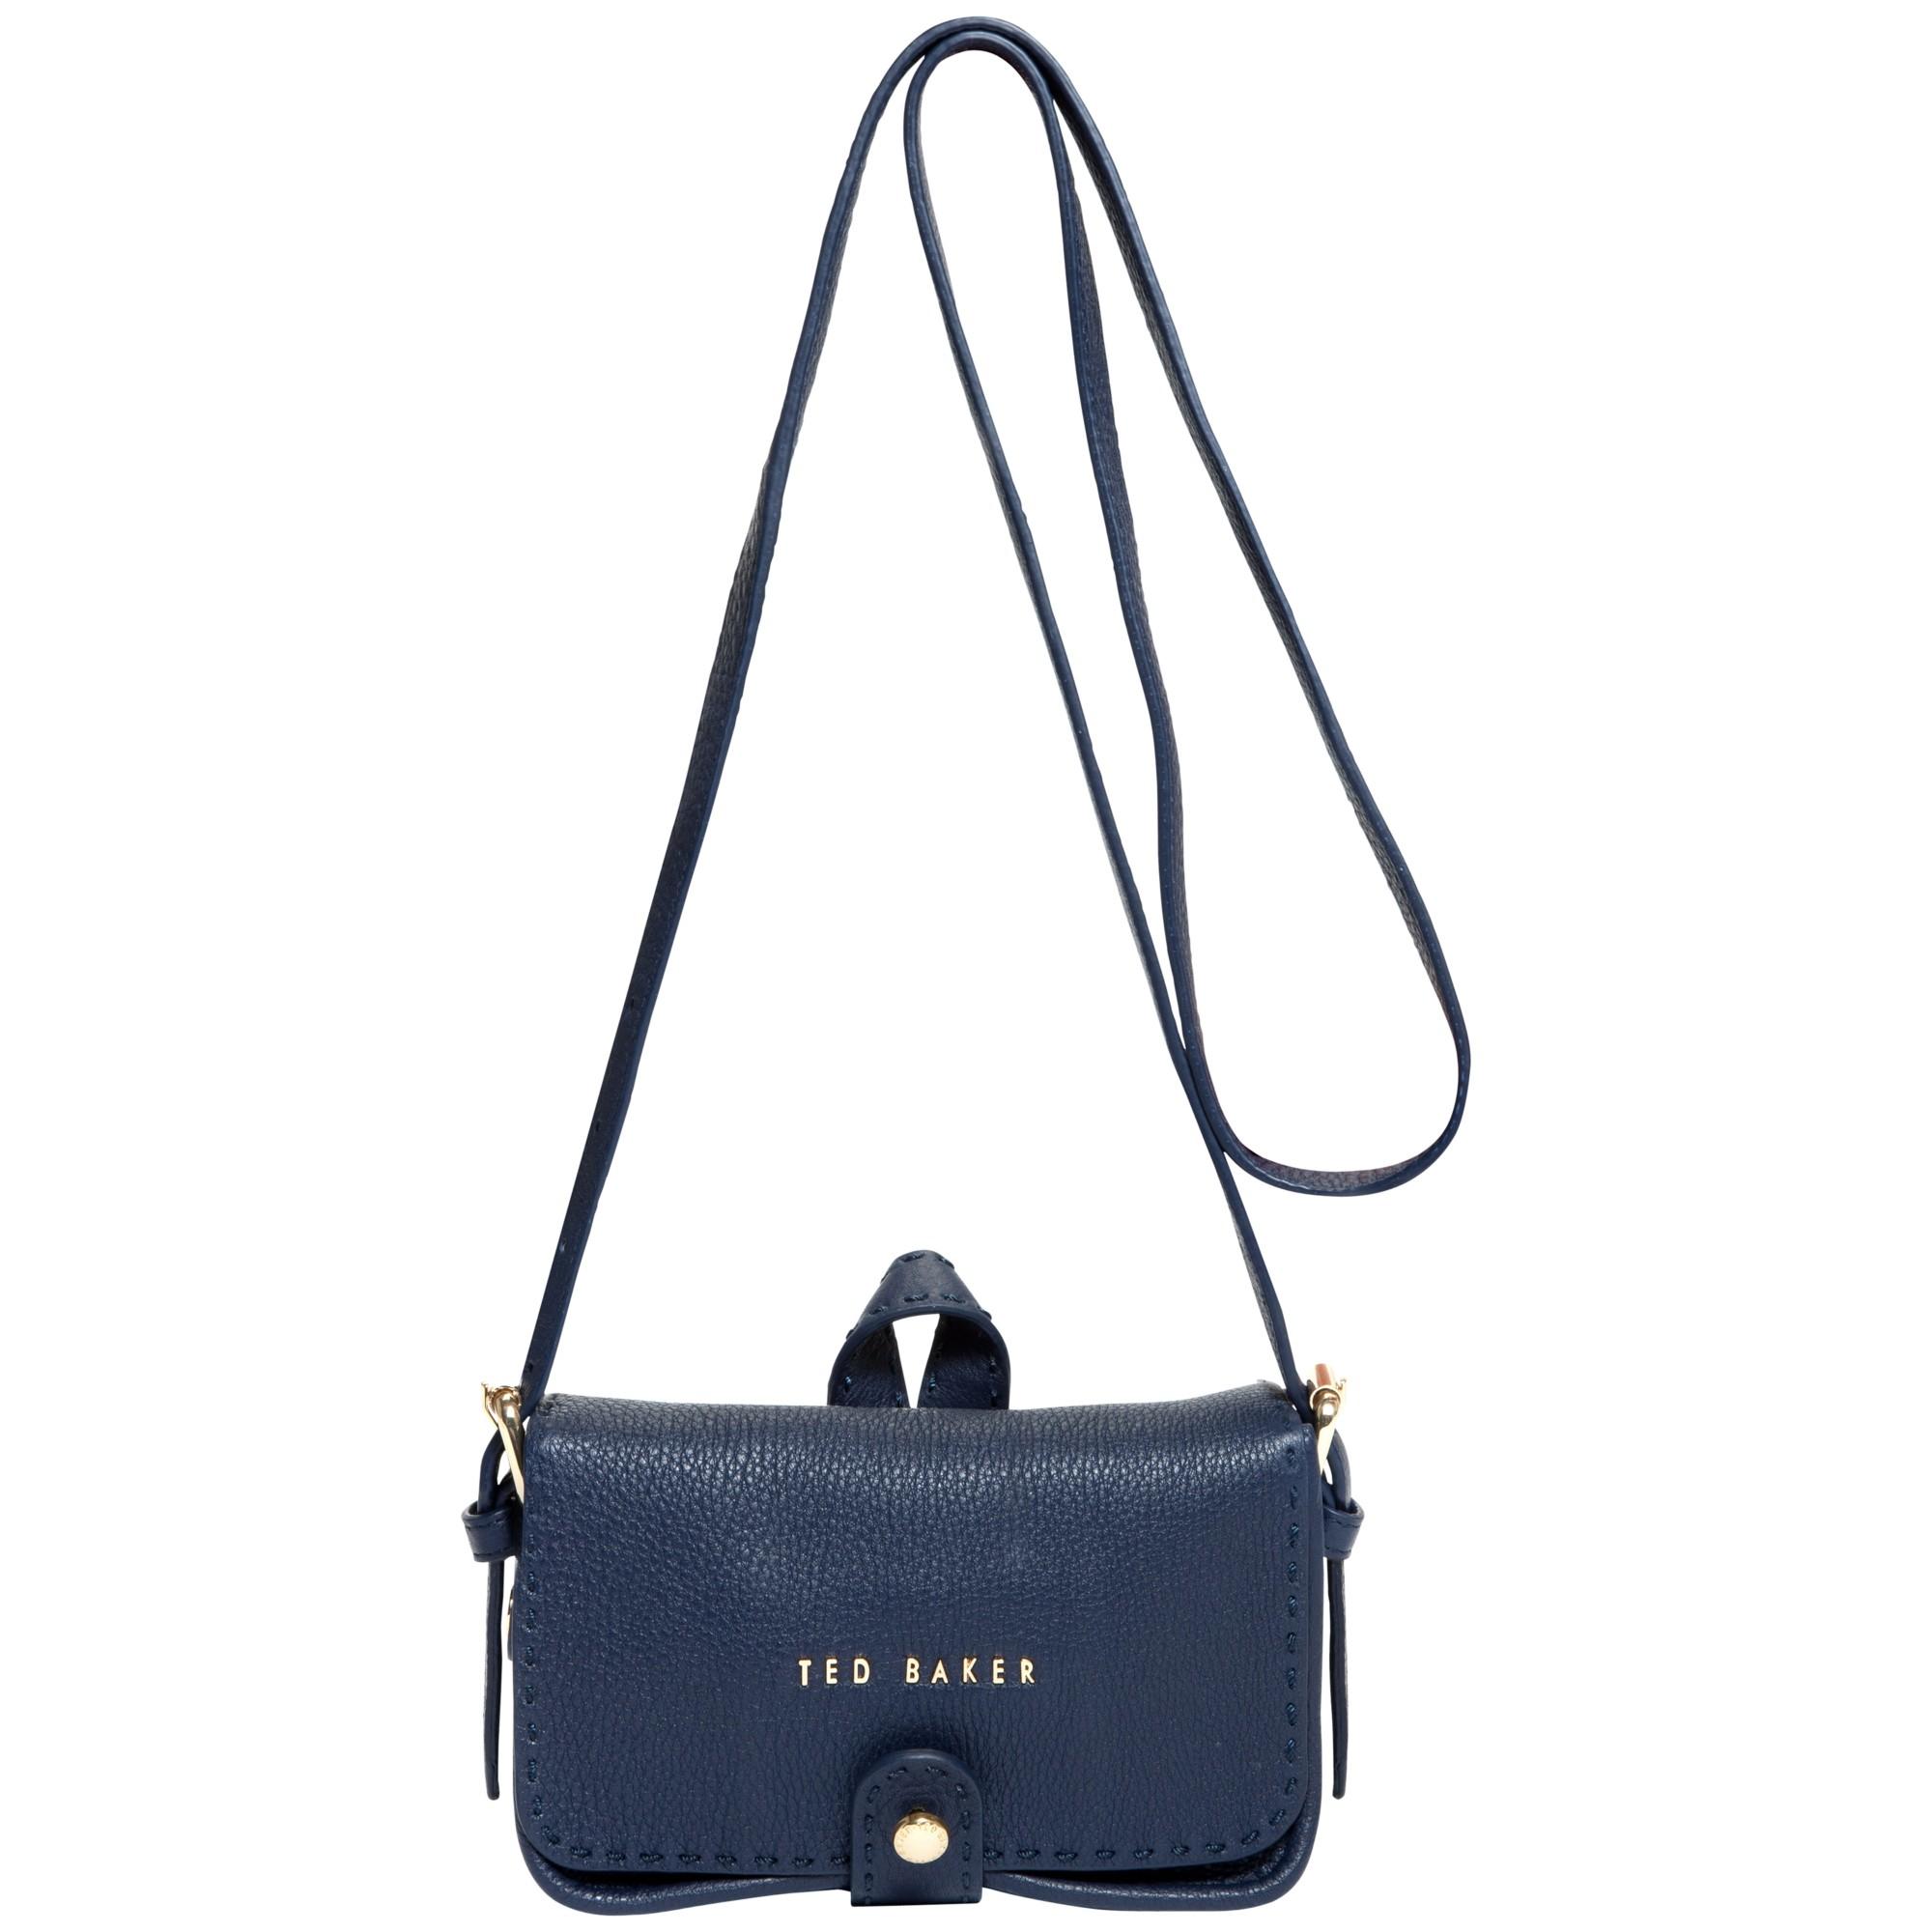 Ted Baker Minimar Stab Stitch Leather Cross Body Bag in Blue - Lyst 85c9af950f75e